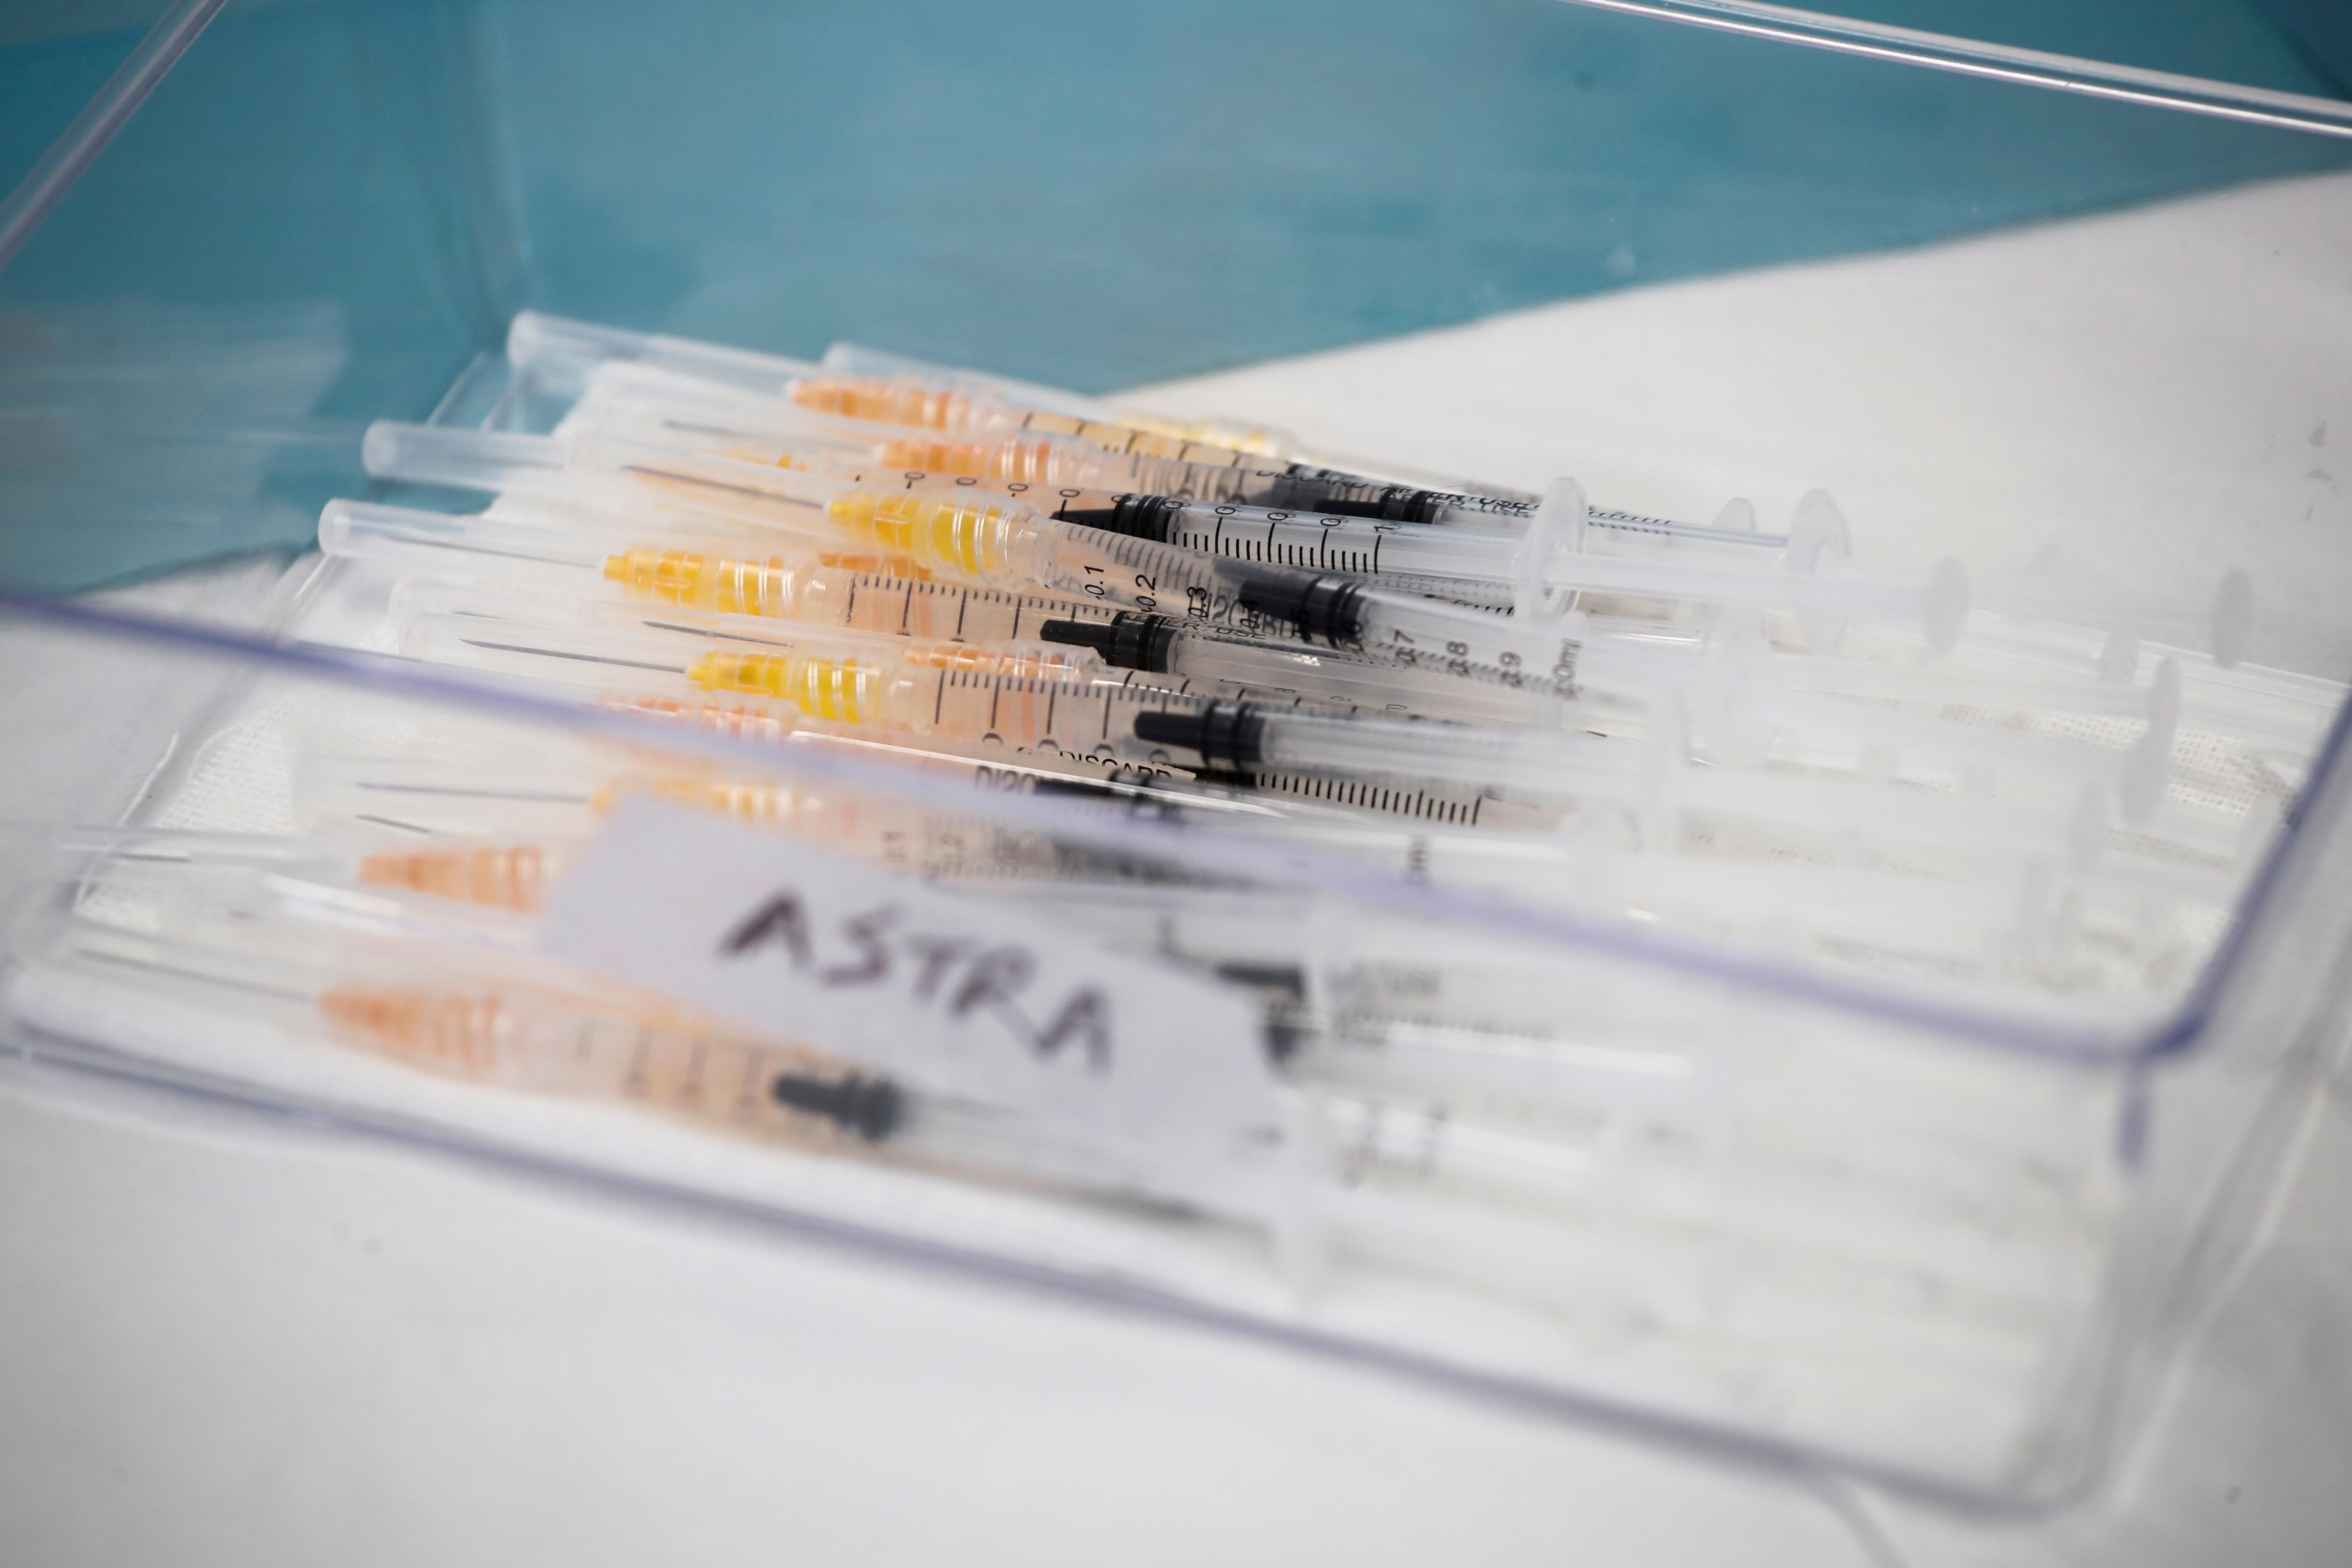 Syringes with AstraZeneca coronavirus disease (COVID-19) vaccines are prepared in Fasano Italy, April 13, 2021. REUTERS/Alessandro Garofalo